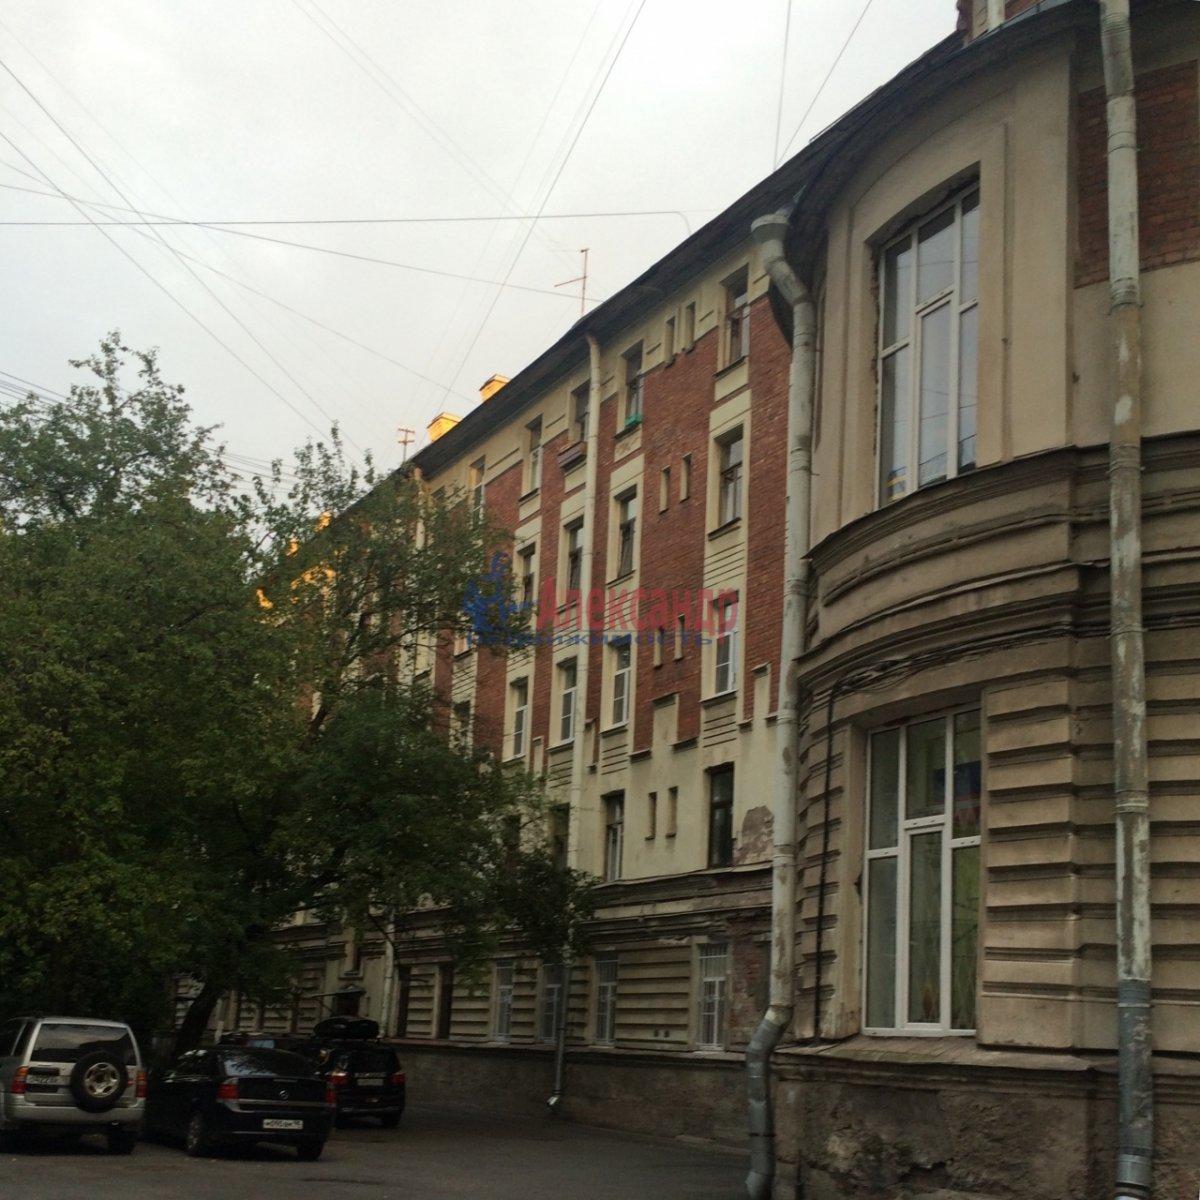 2-комнатная квартира (31м2) в аренду по адресу Гаванская ул., 47— фото 2 из 3